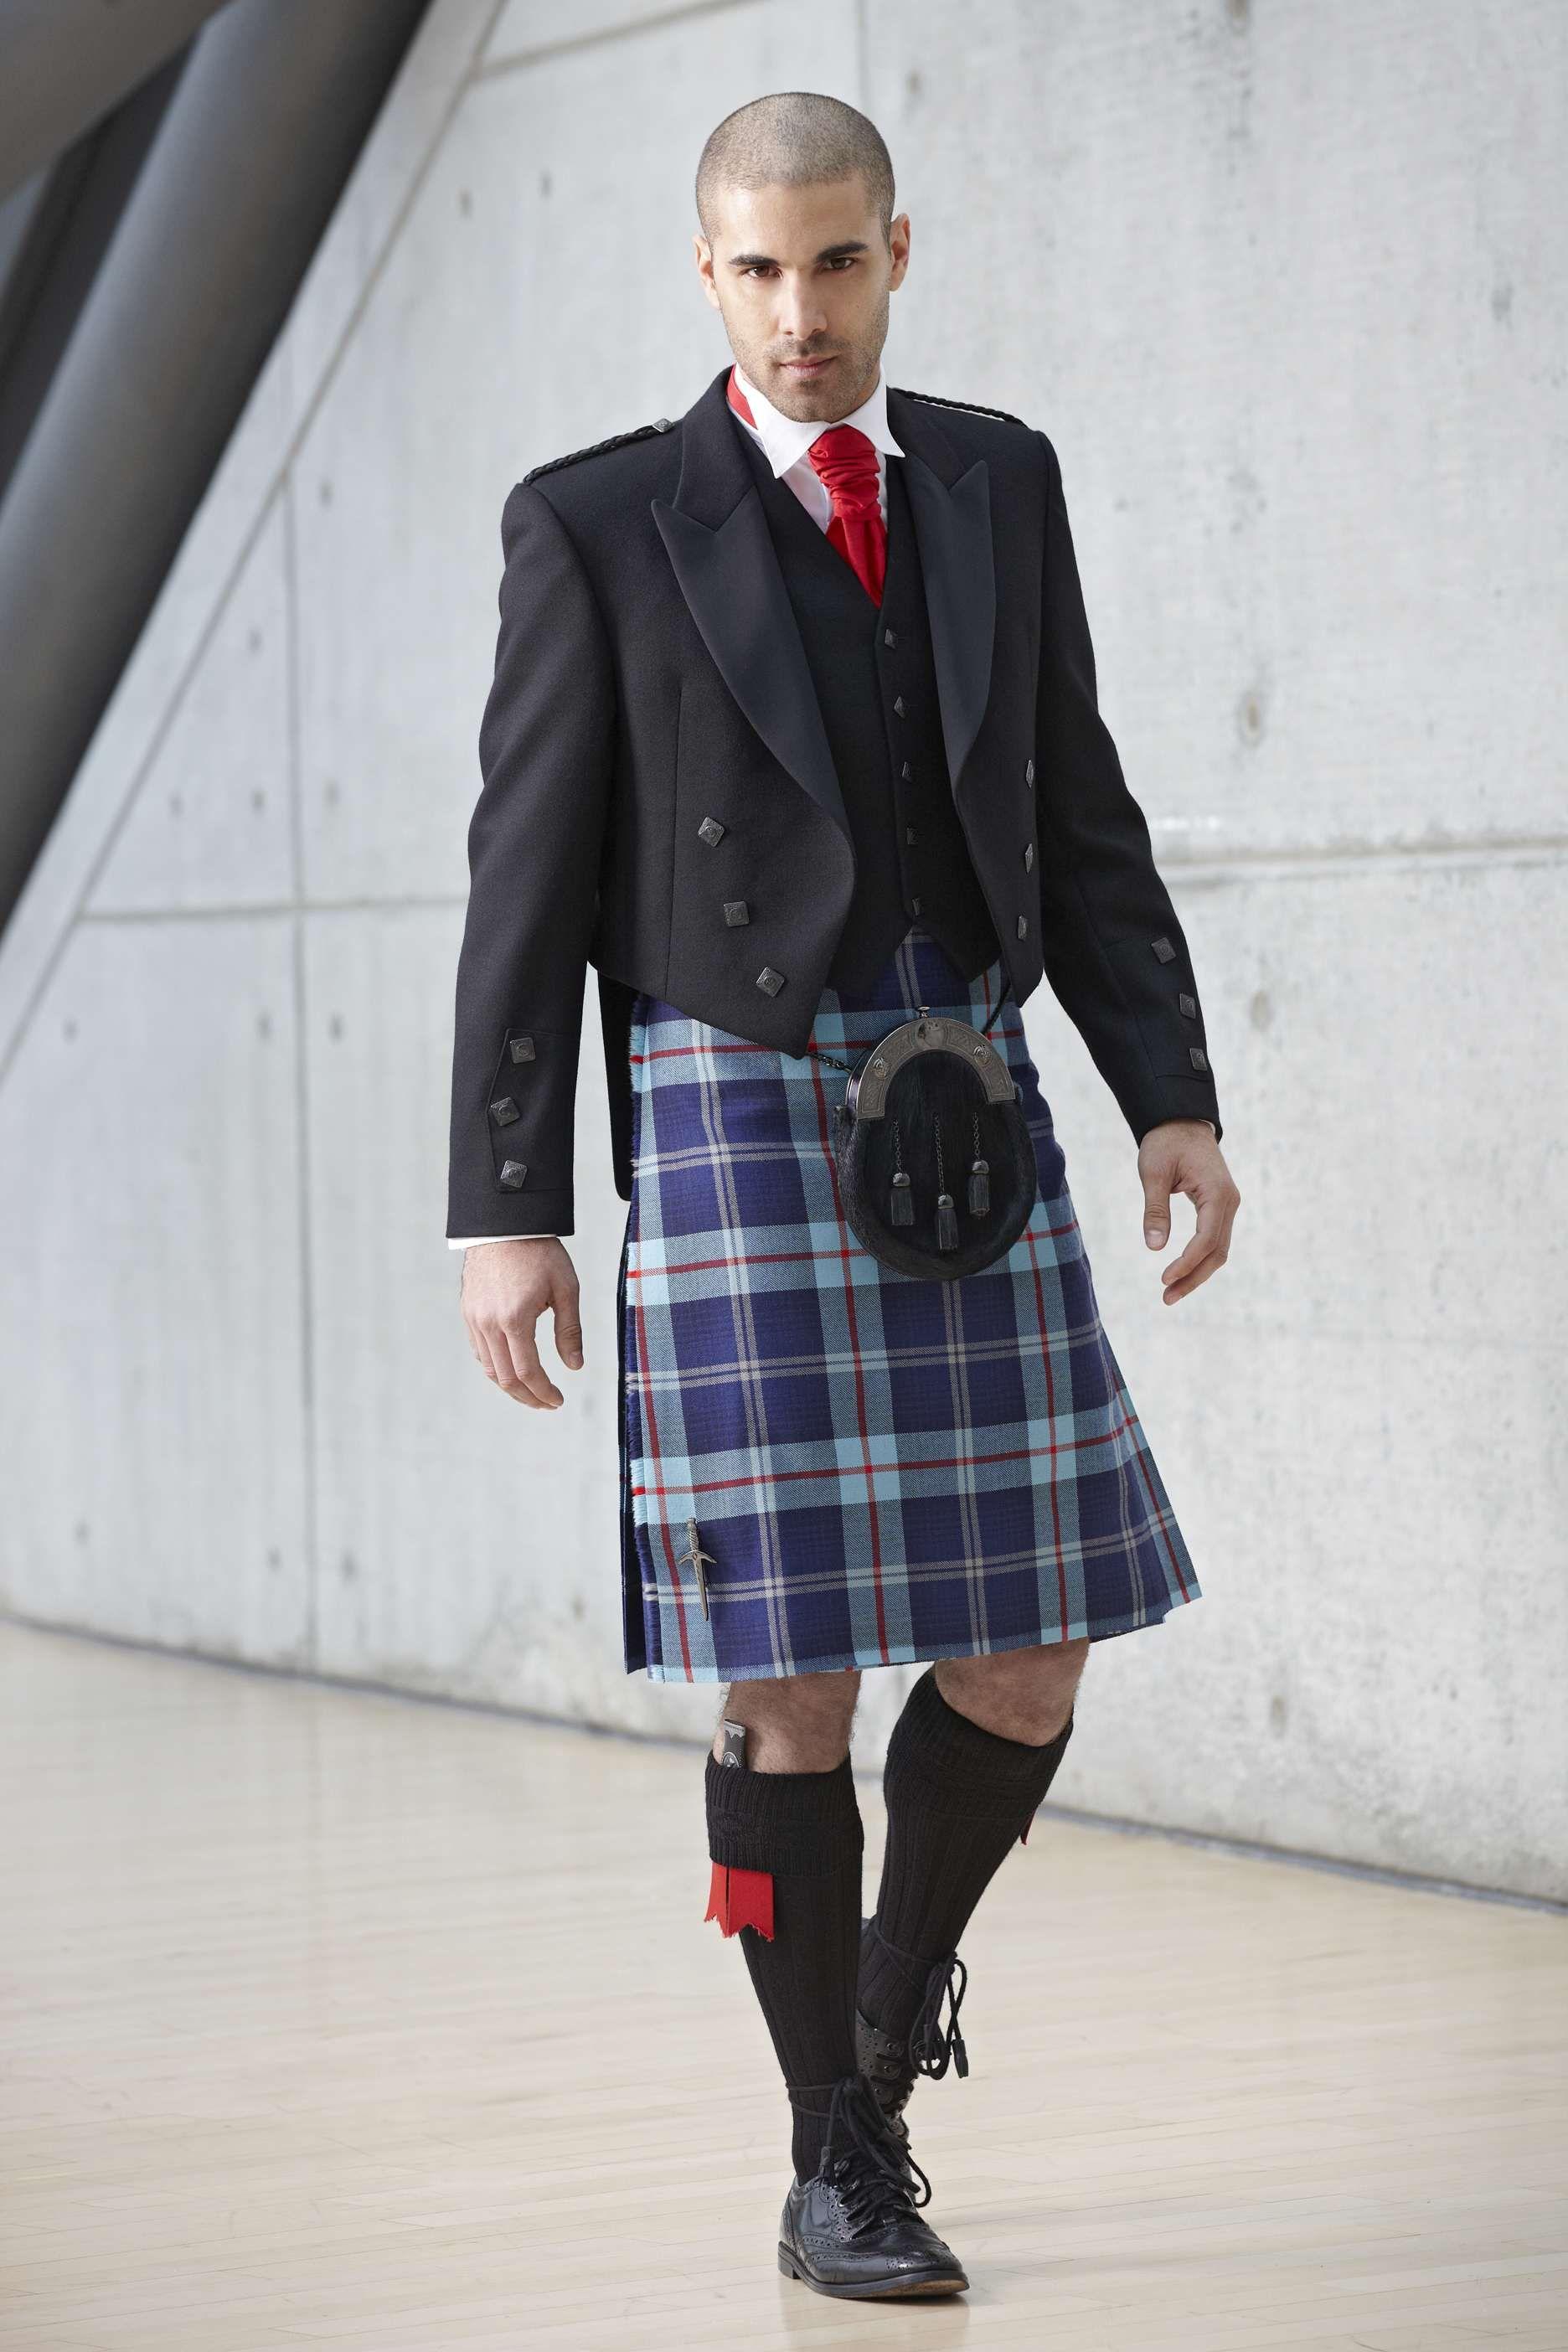 Help For Heroes Tartan | Kilts for the Groom | Highlandwear